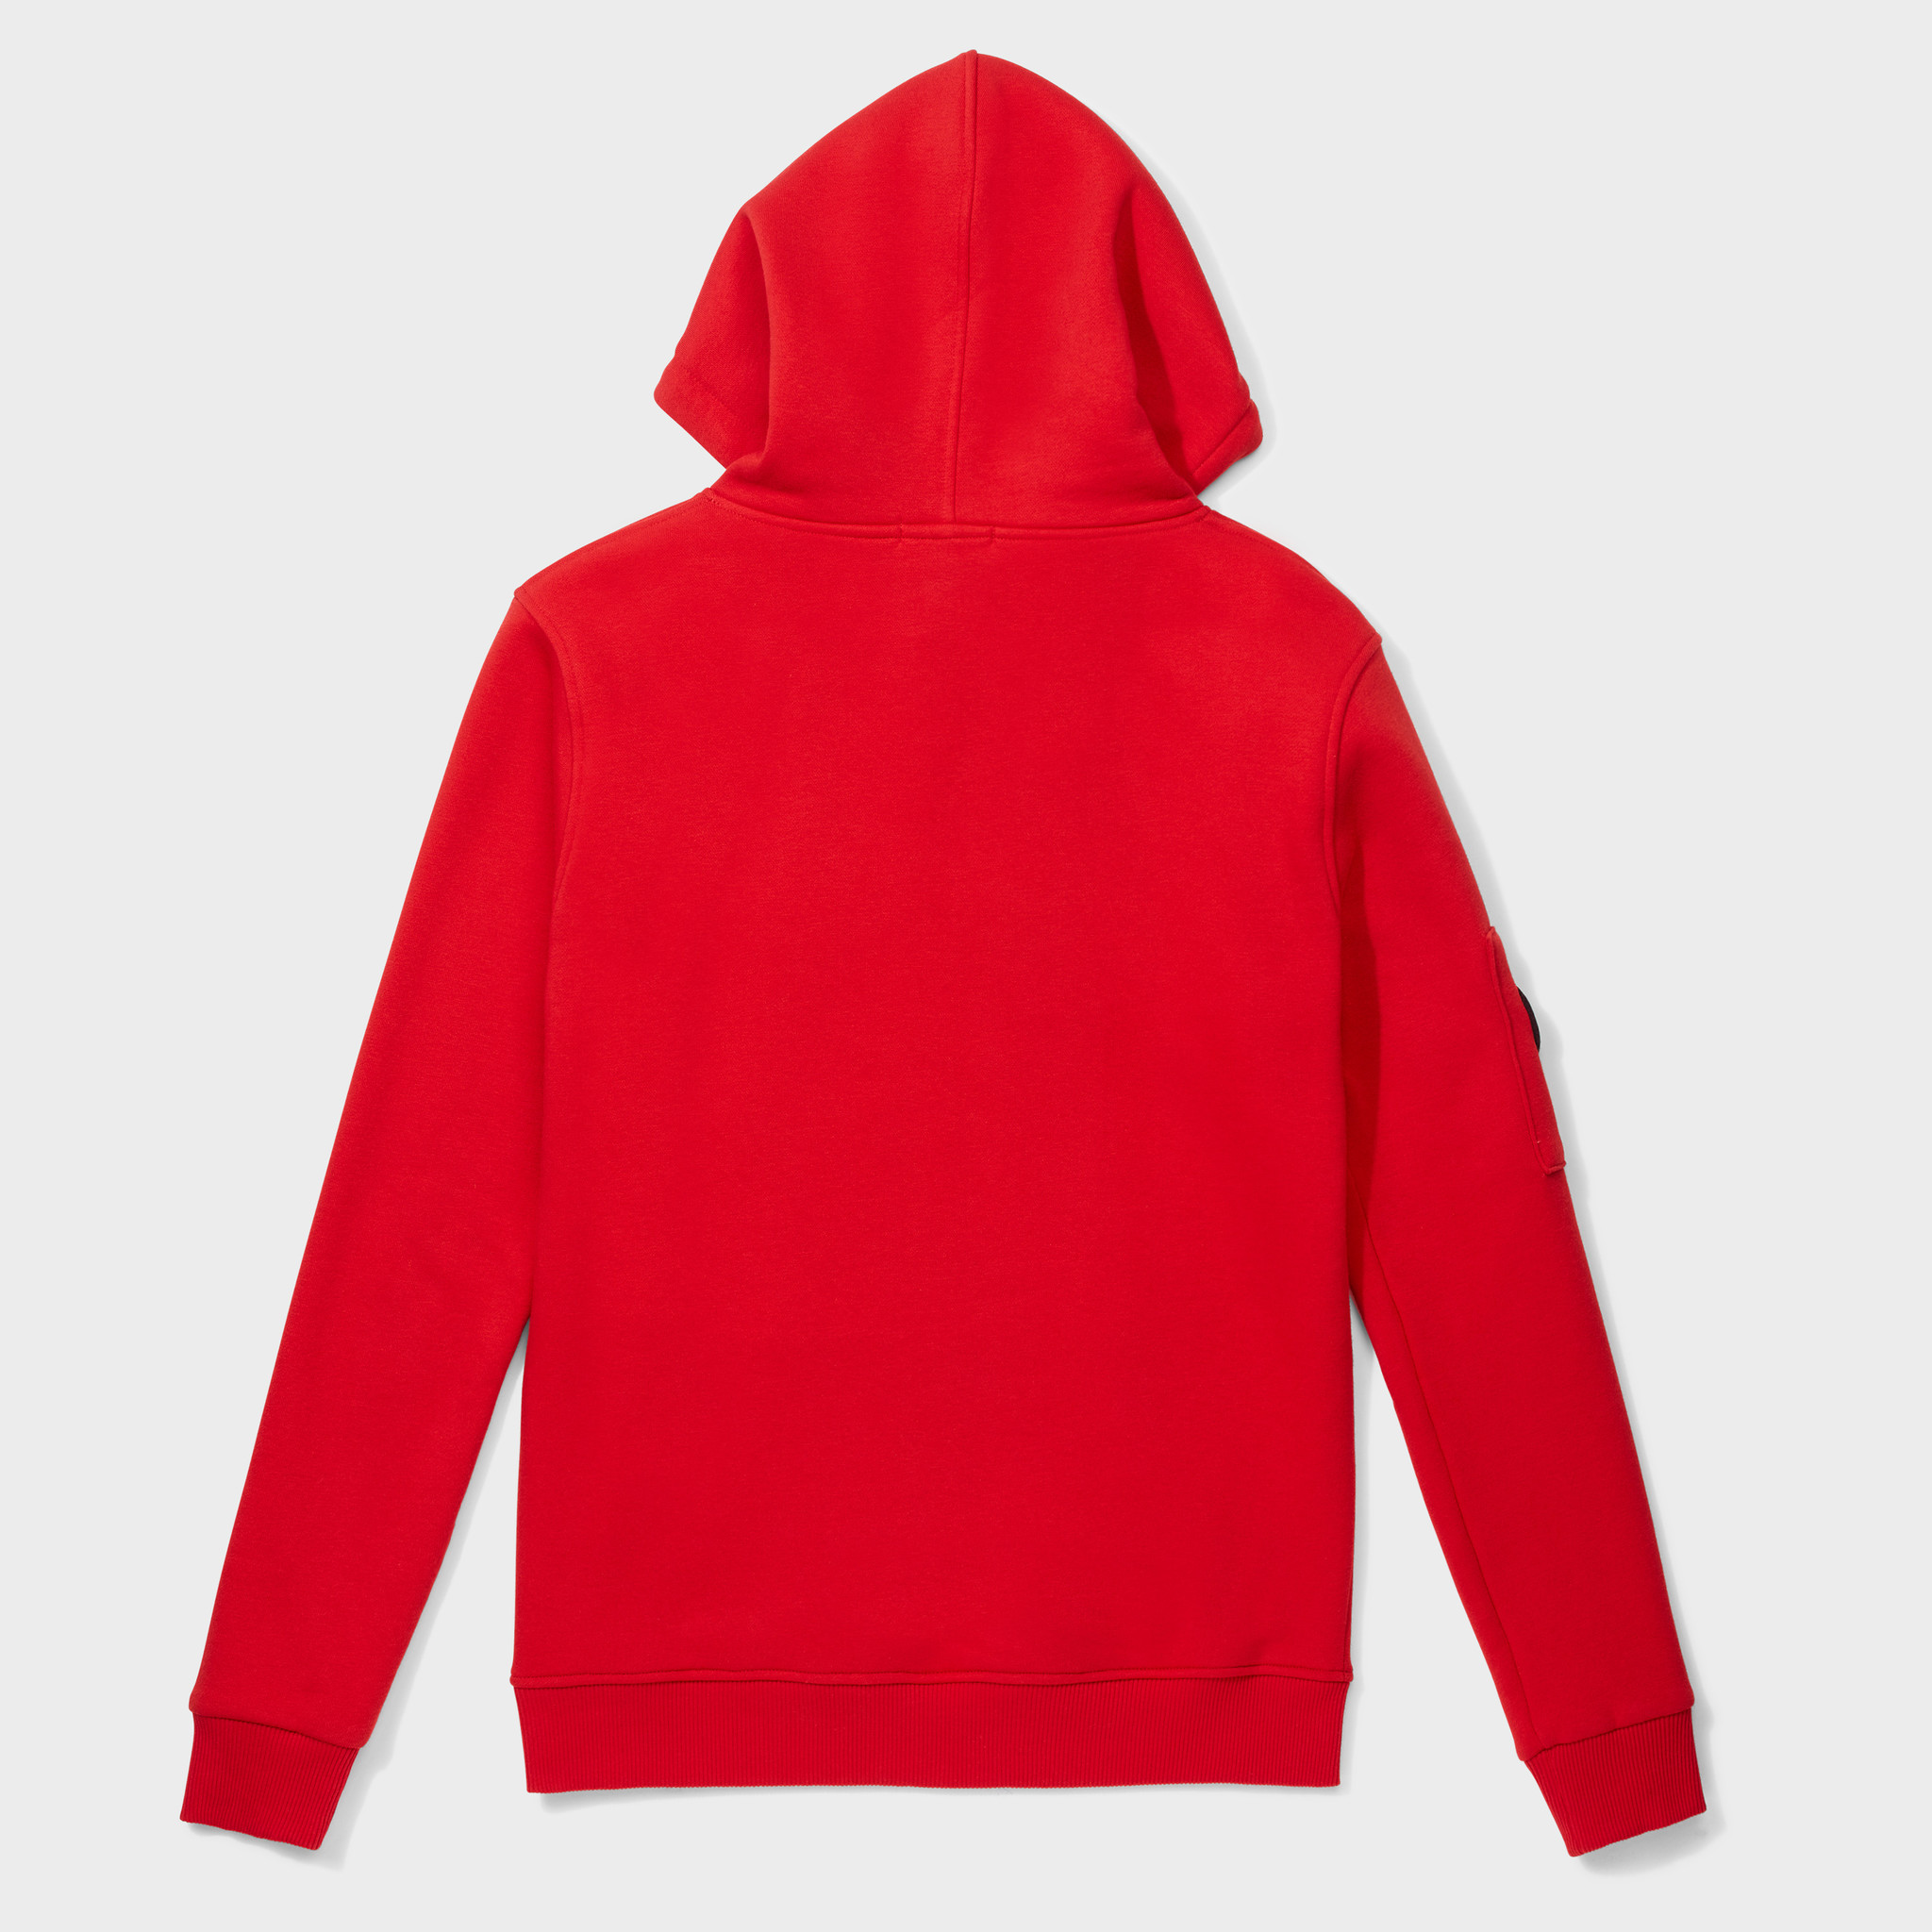 SIGNATURE HOODIE RED & BLACK-2